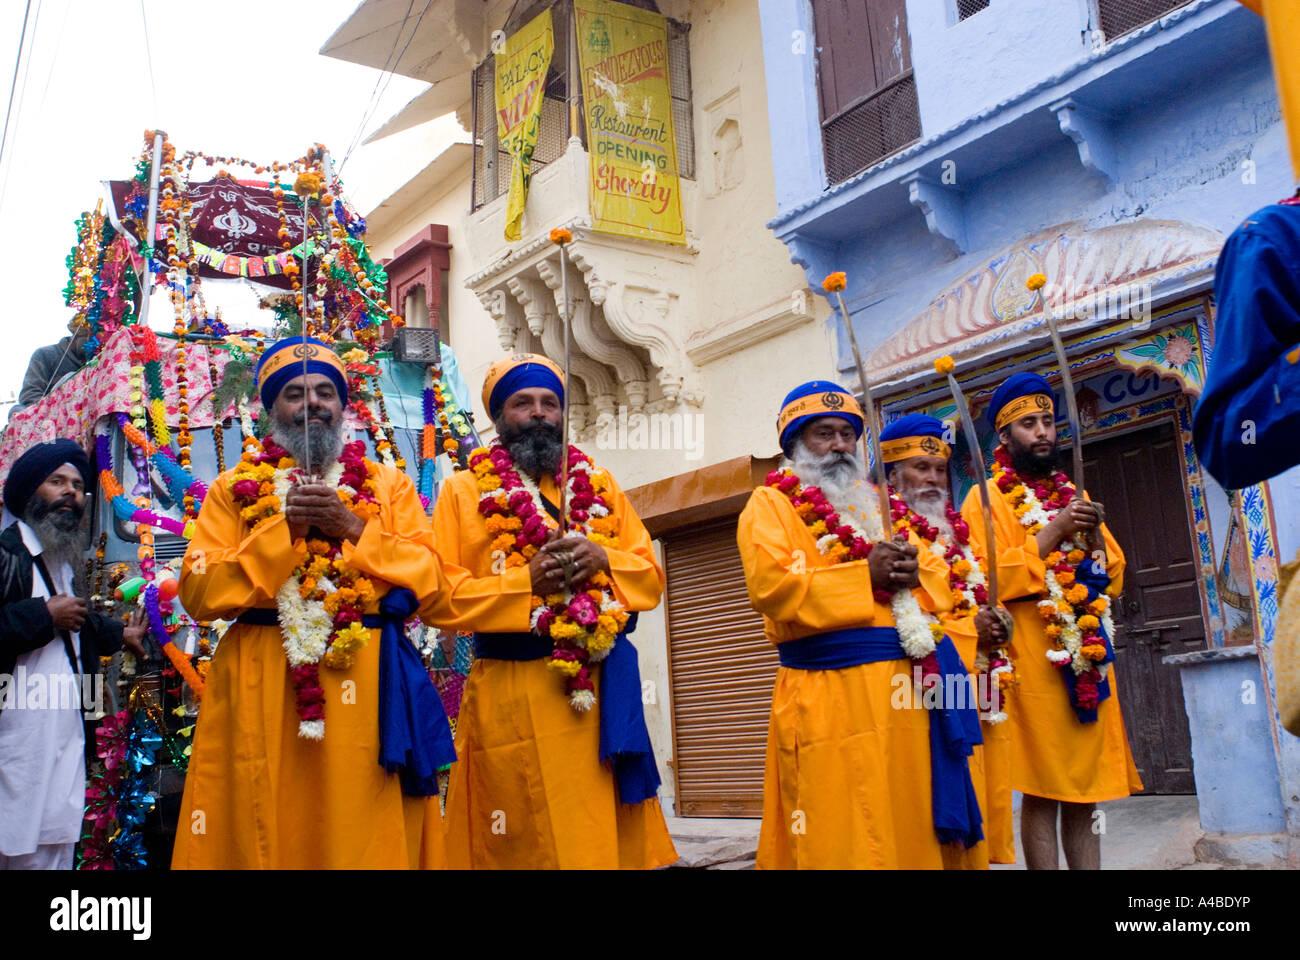 Immagine di stock di Gurupurab festival Sikh di Bhai Amar Das o Bhai Amardas in Bundi Rajasthan in India Immagini Stock